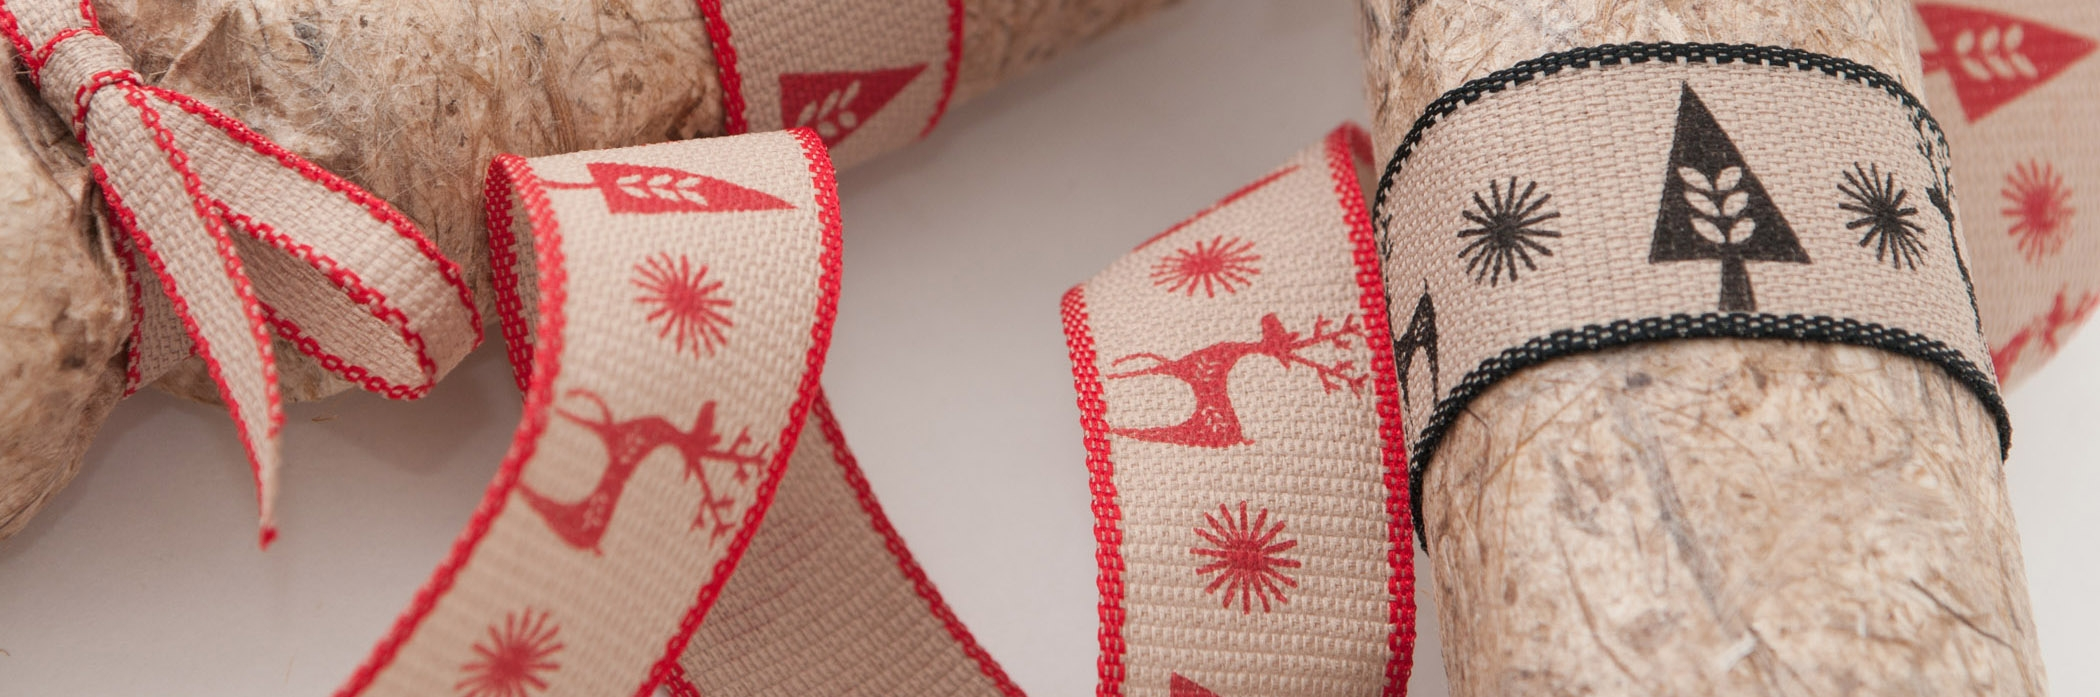 Christmas Tree Ribbons